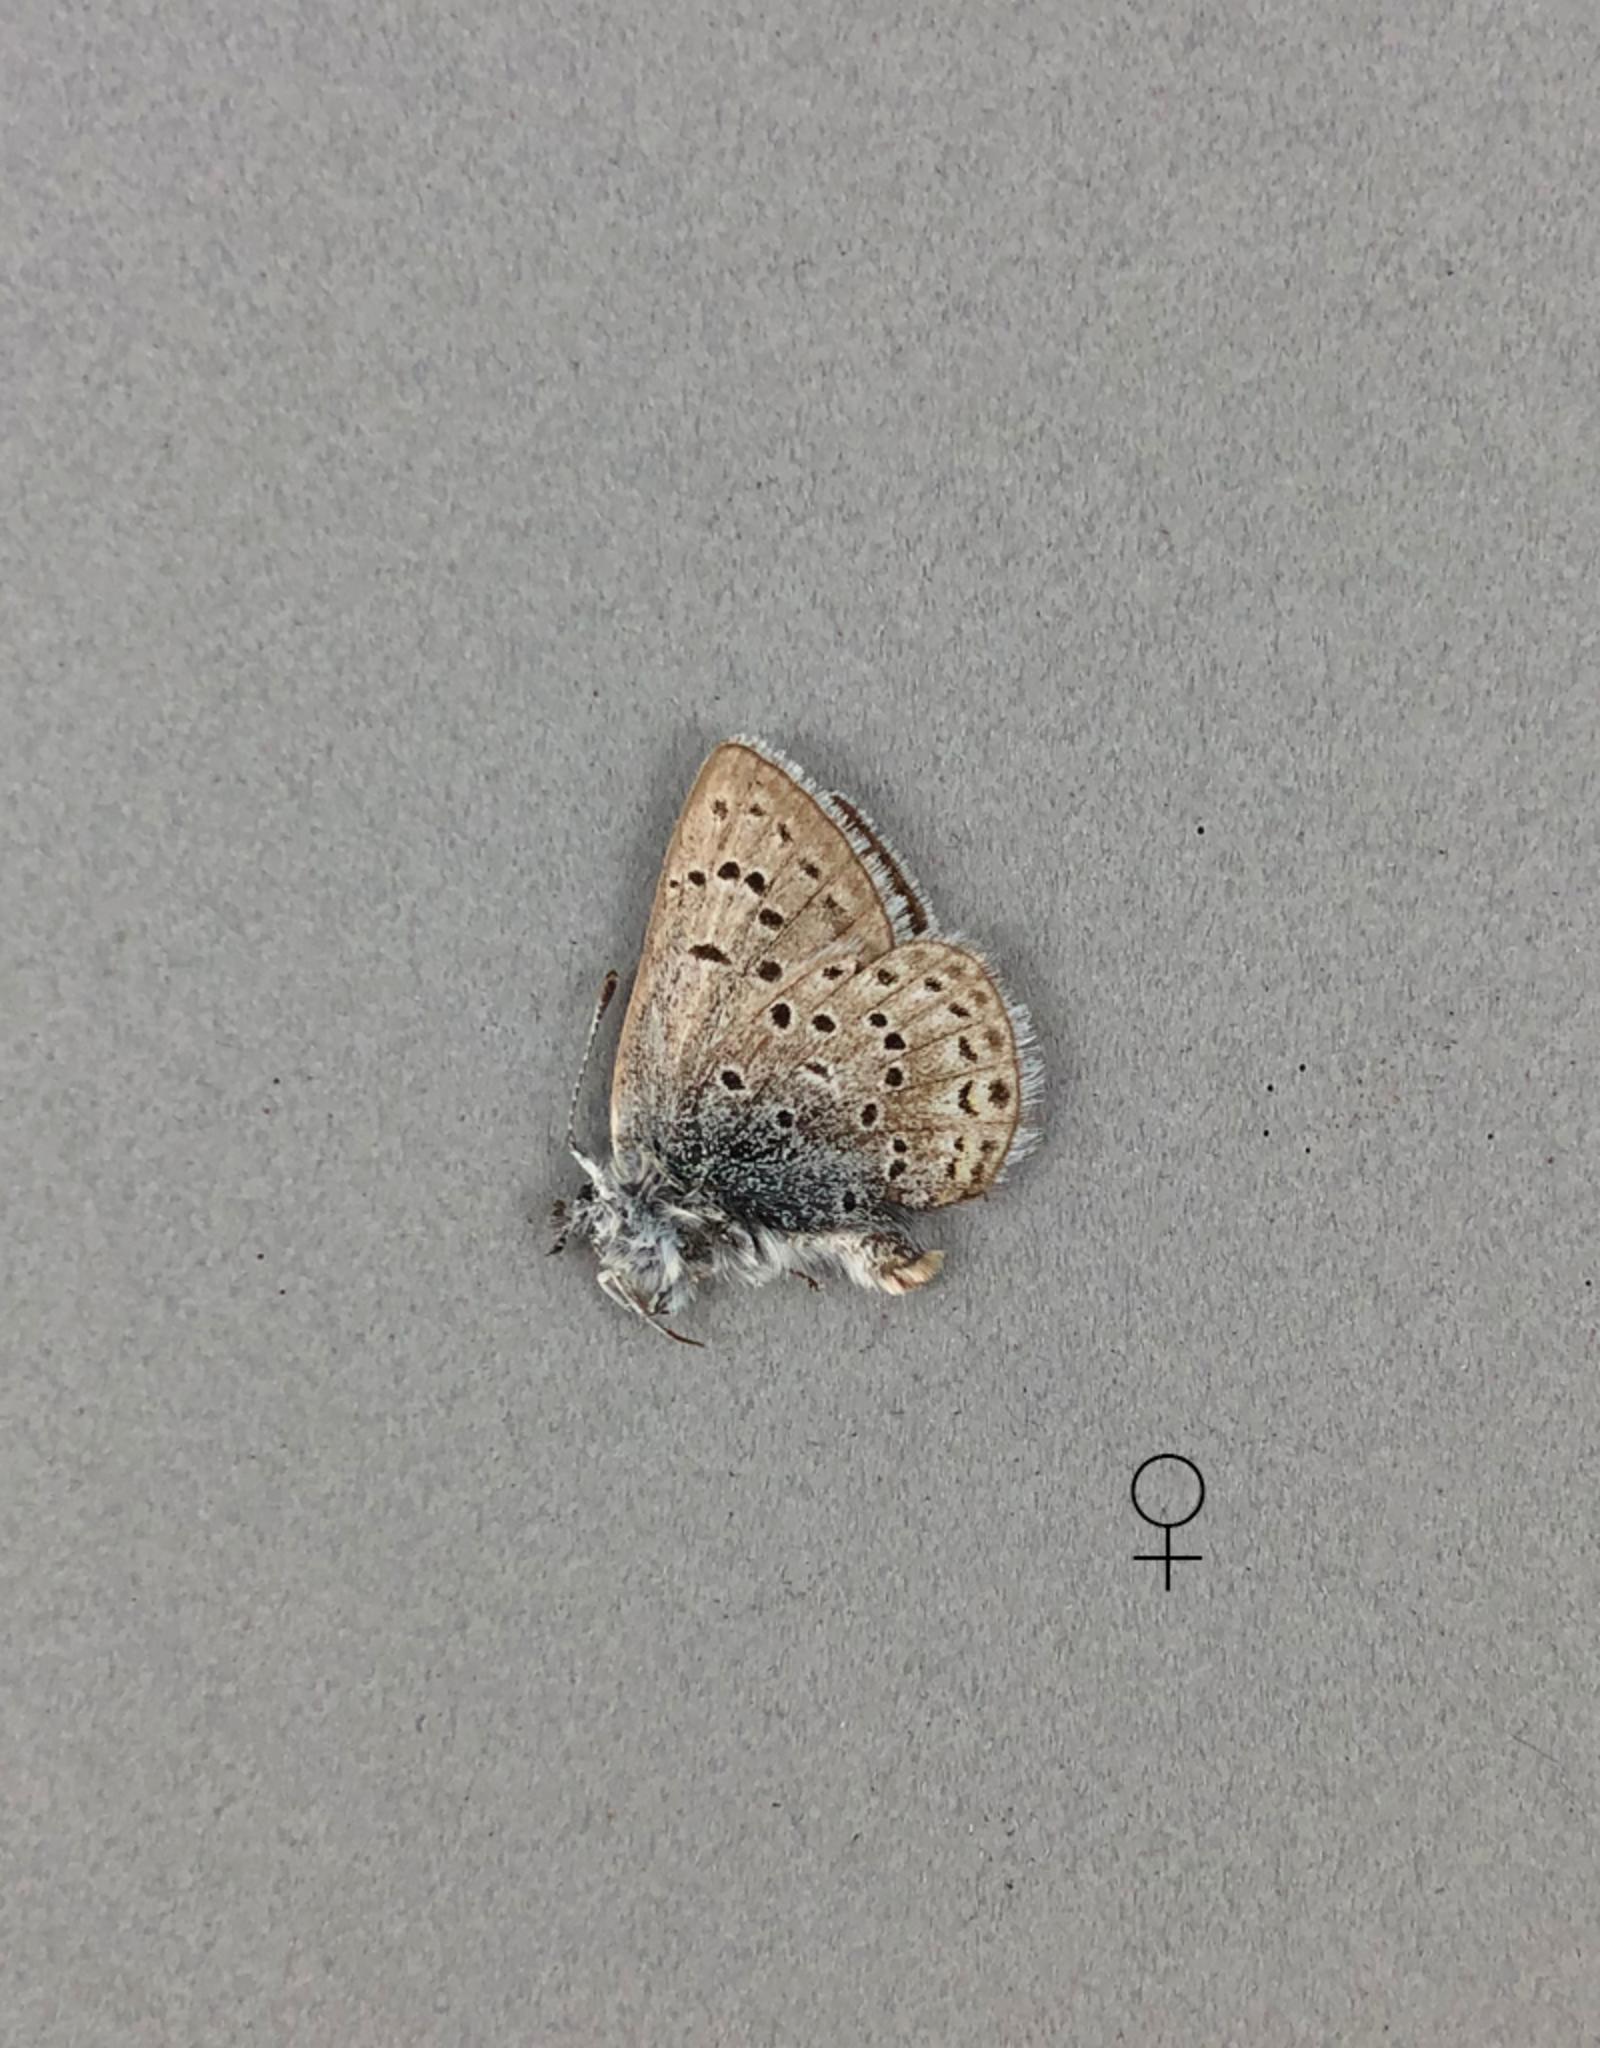 Lycaeides idas alaskensis PAIR A1 Canada